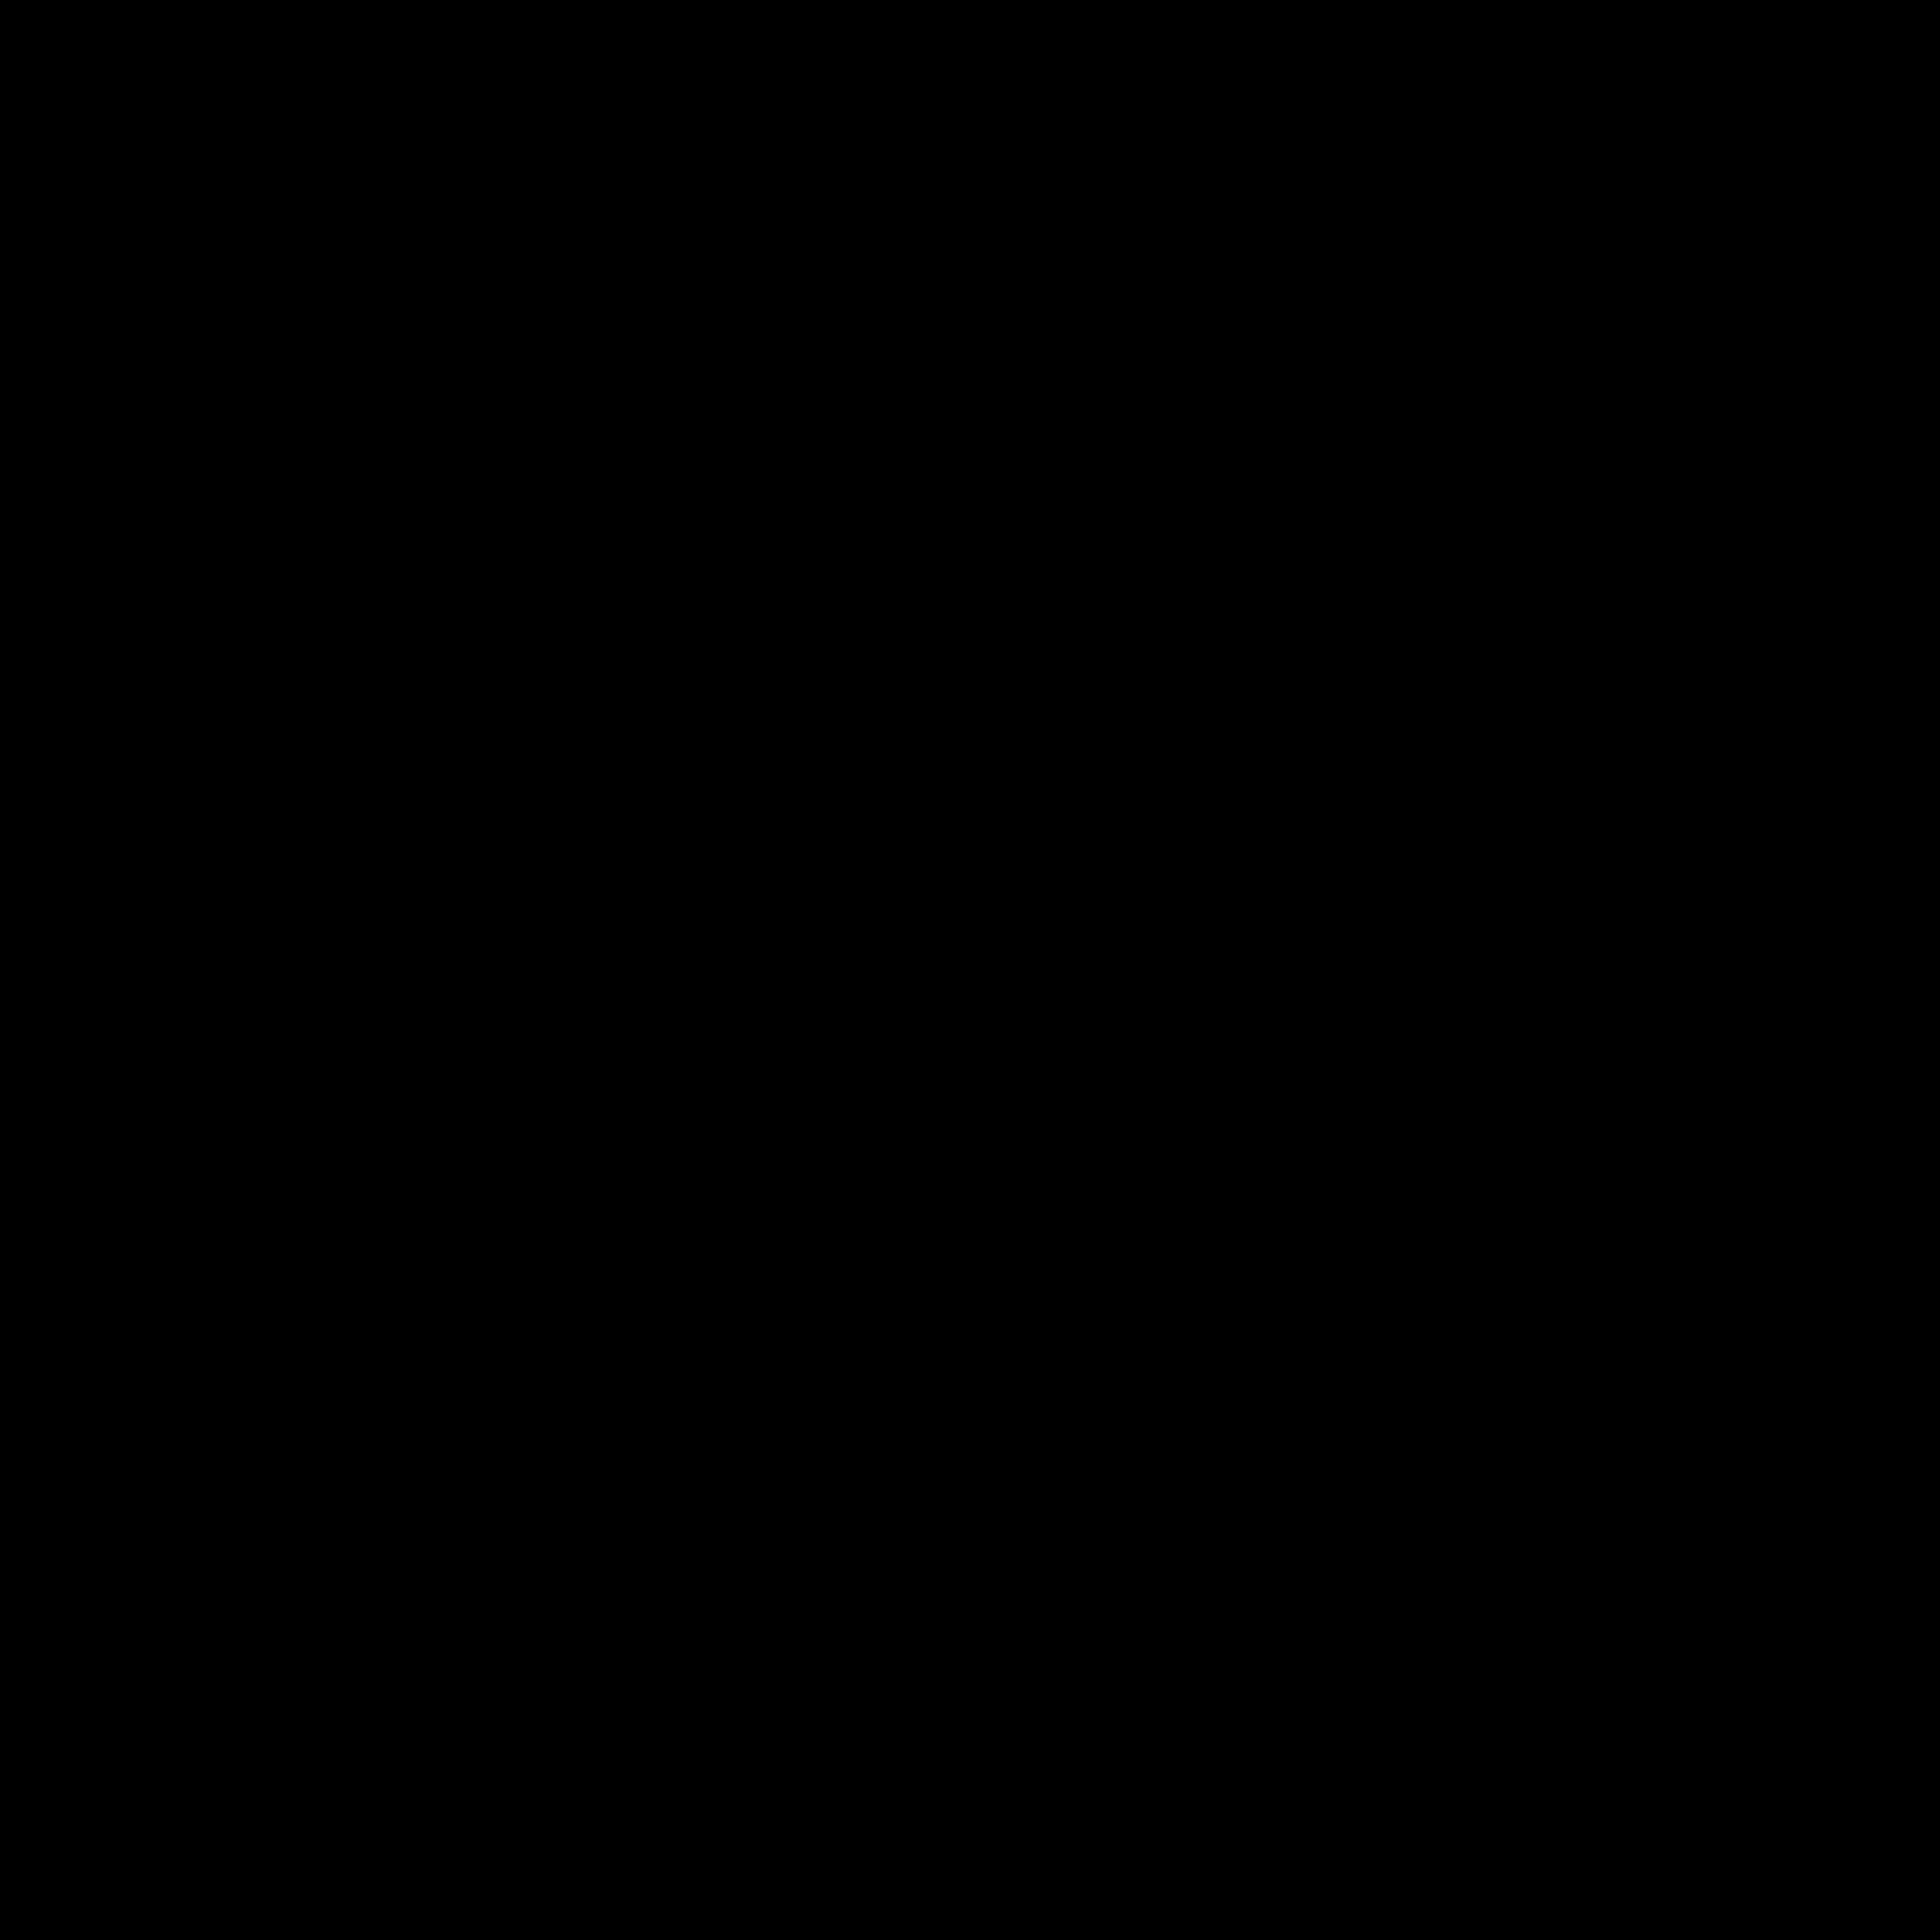 Clipart stars pdf. Baha i nine pointed